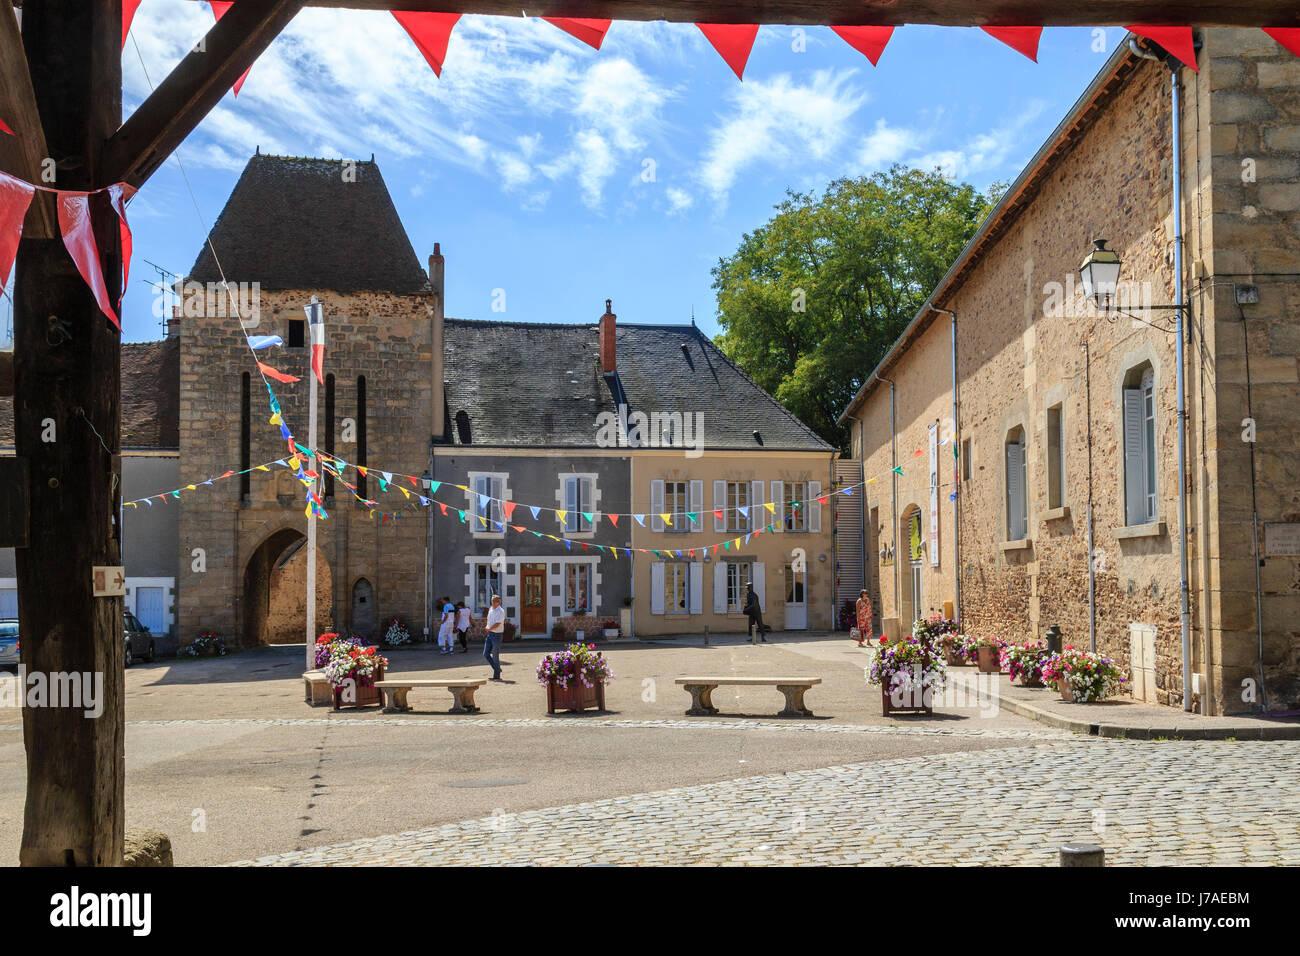 France, Indre, Sainte Severe sur Indre, Marche square, Stock Photo